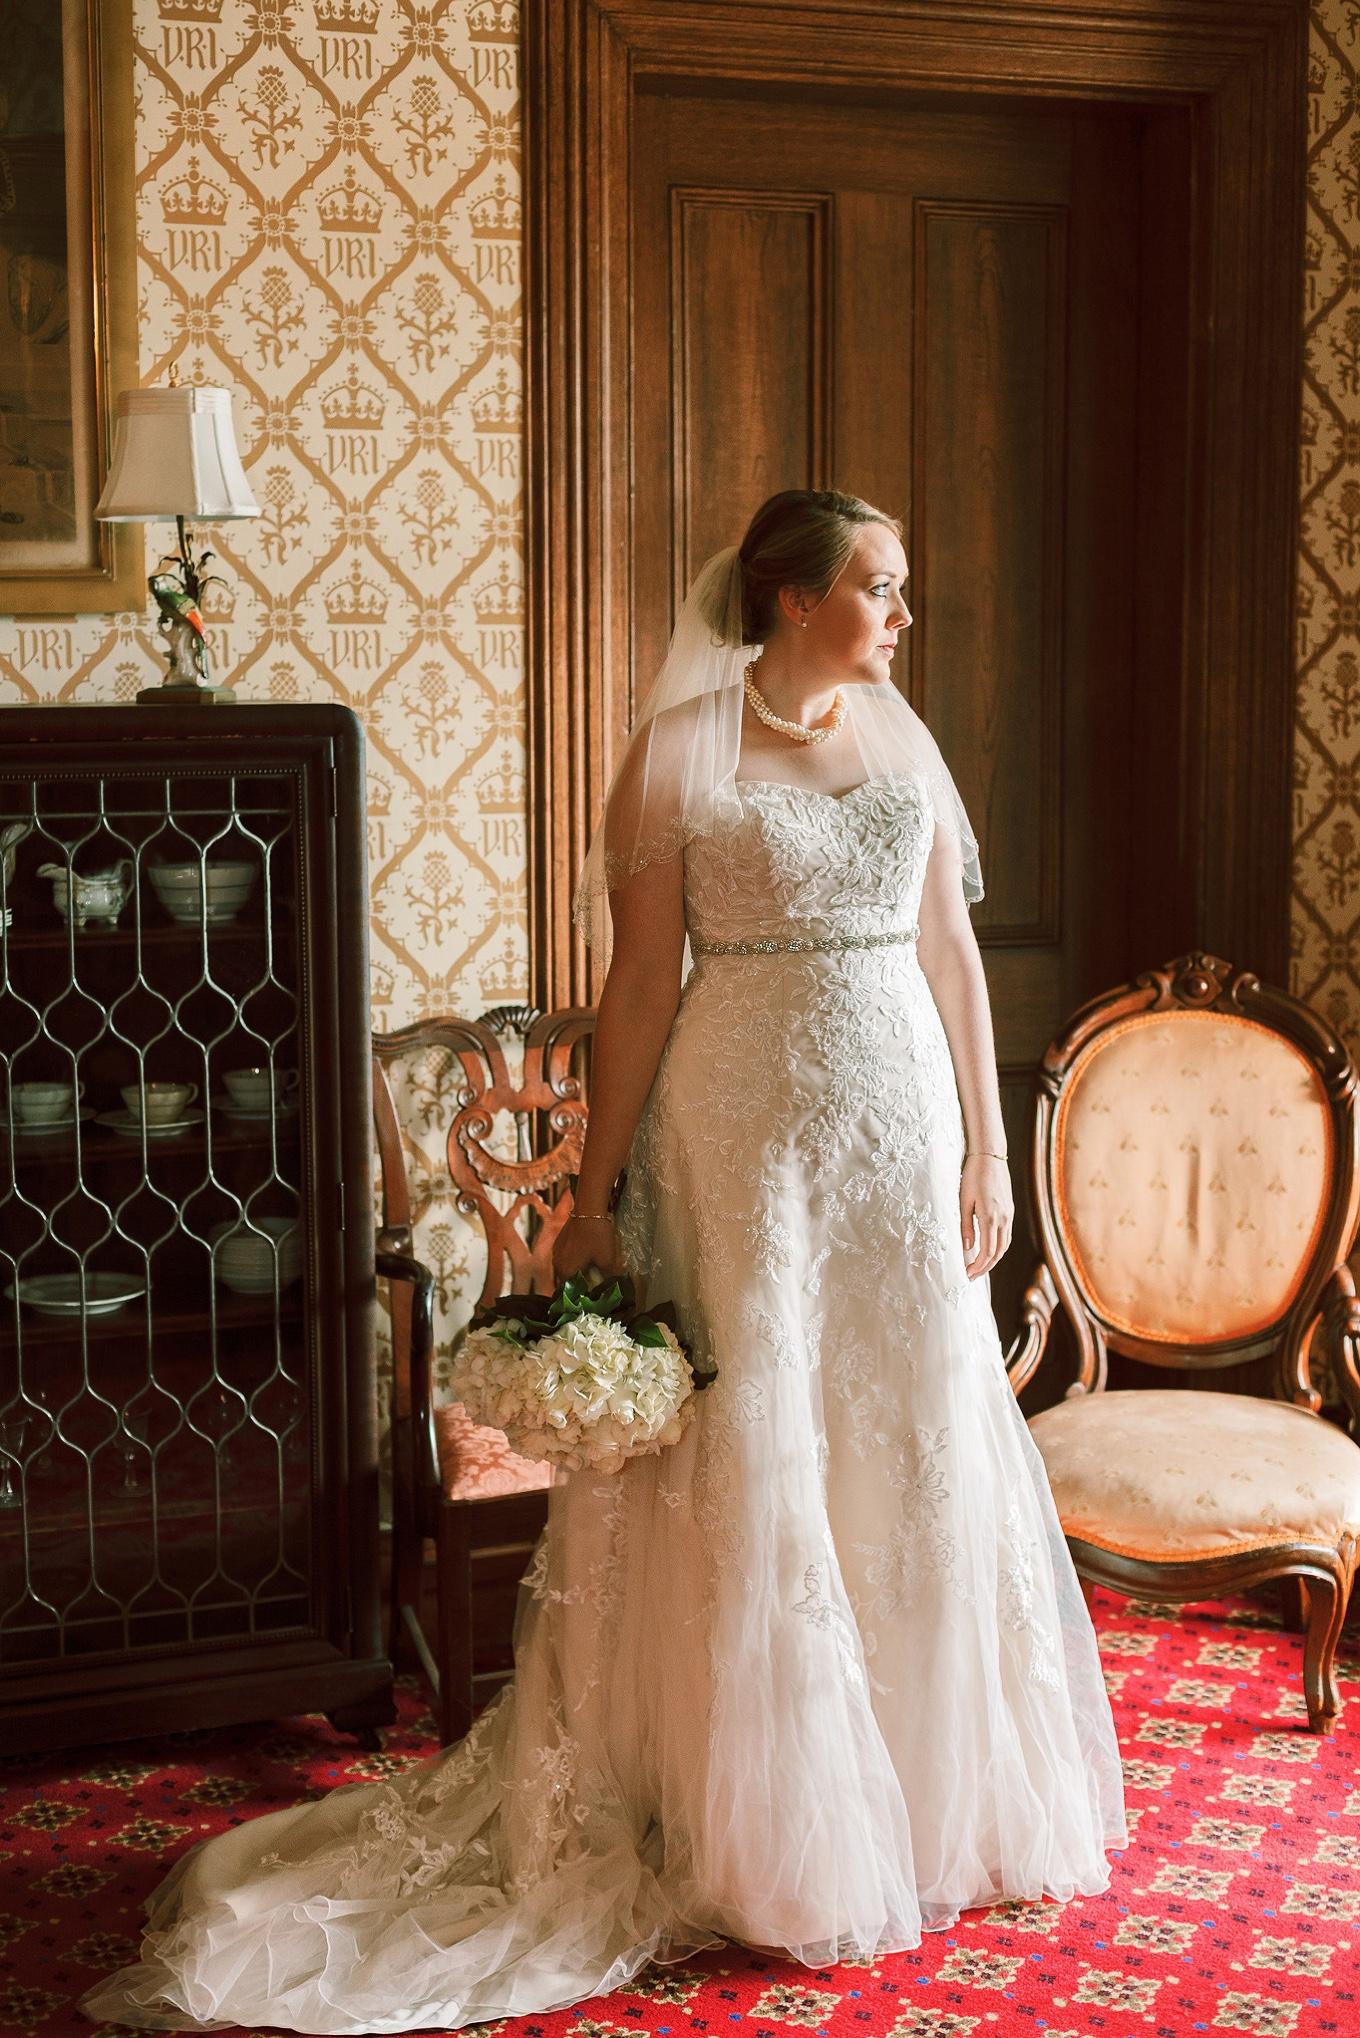 15_richmond-wedding-bolling-haxall-house-june2019-26.jpg